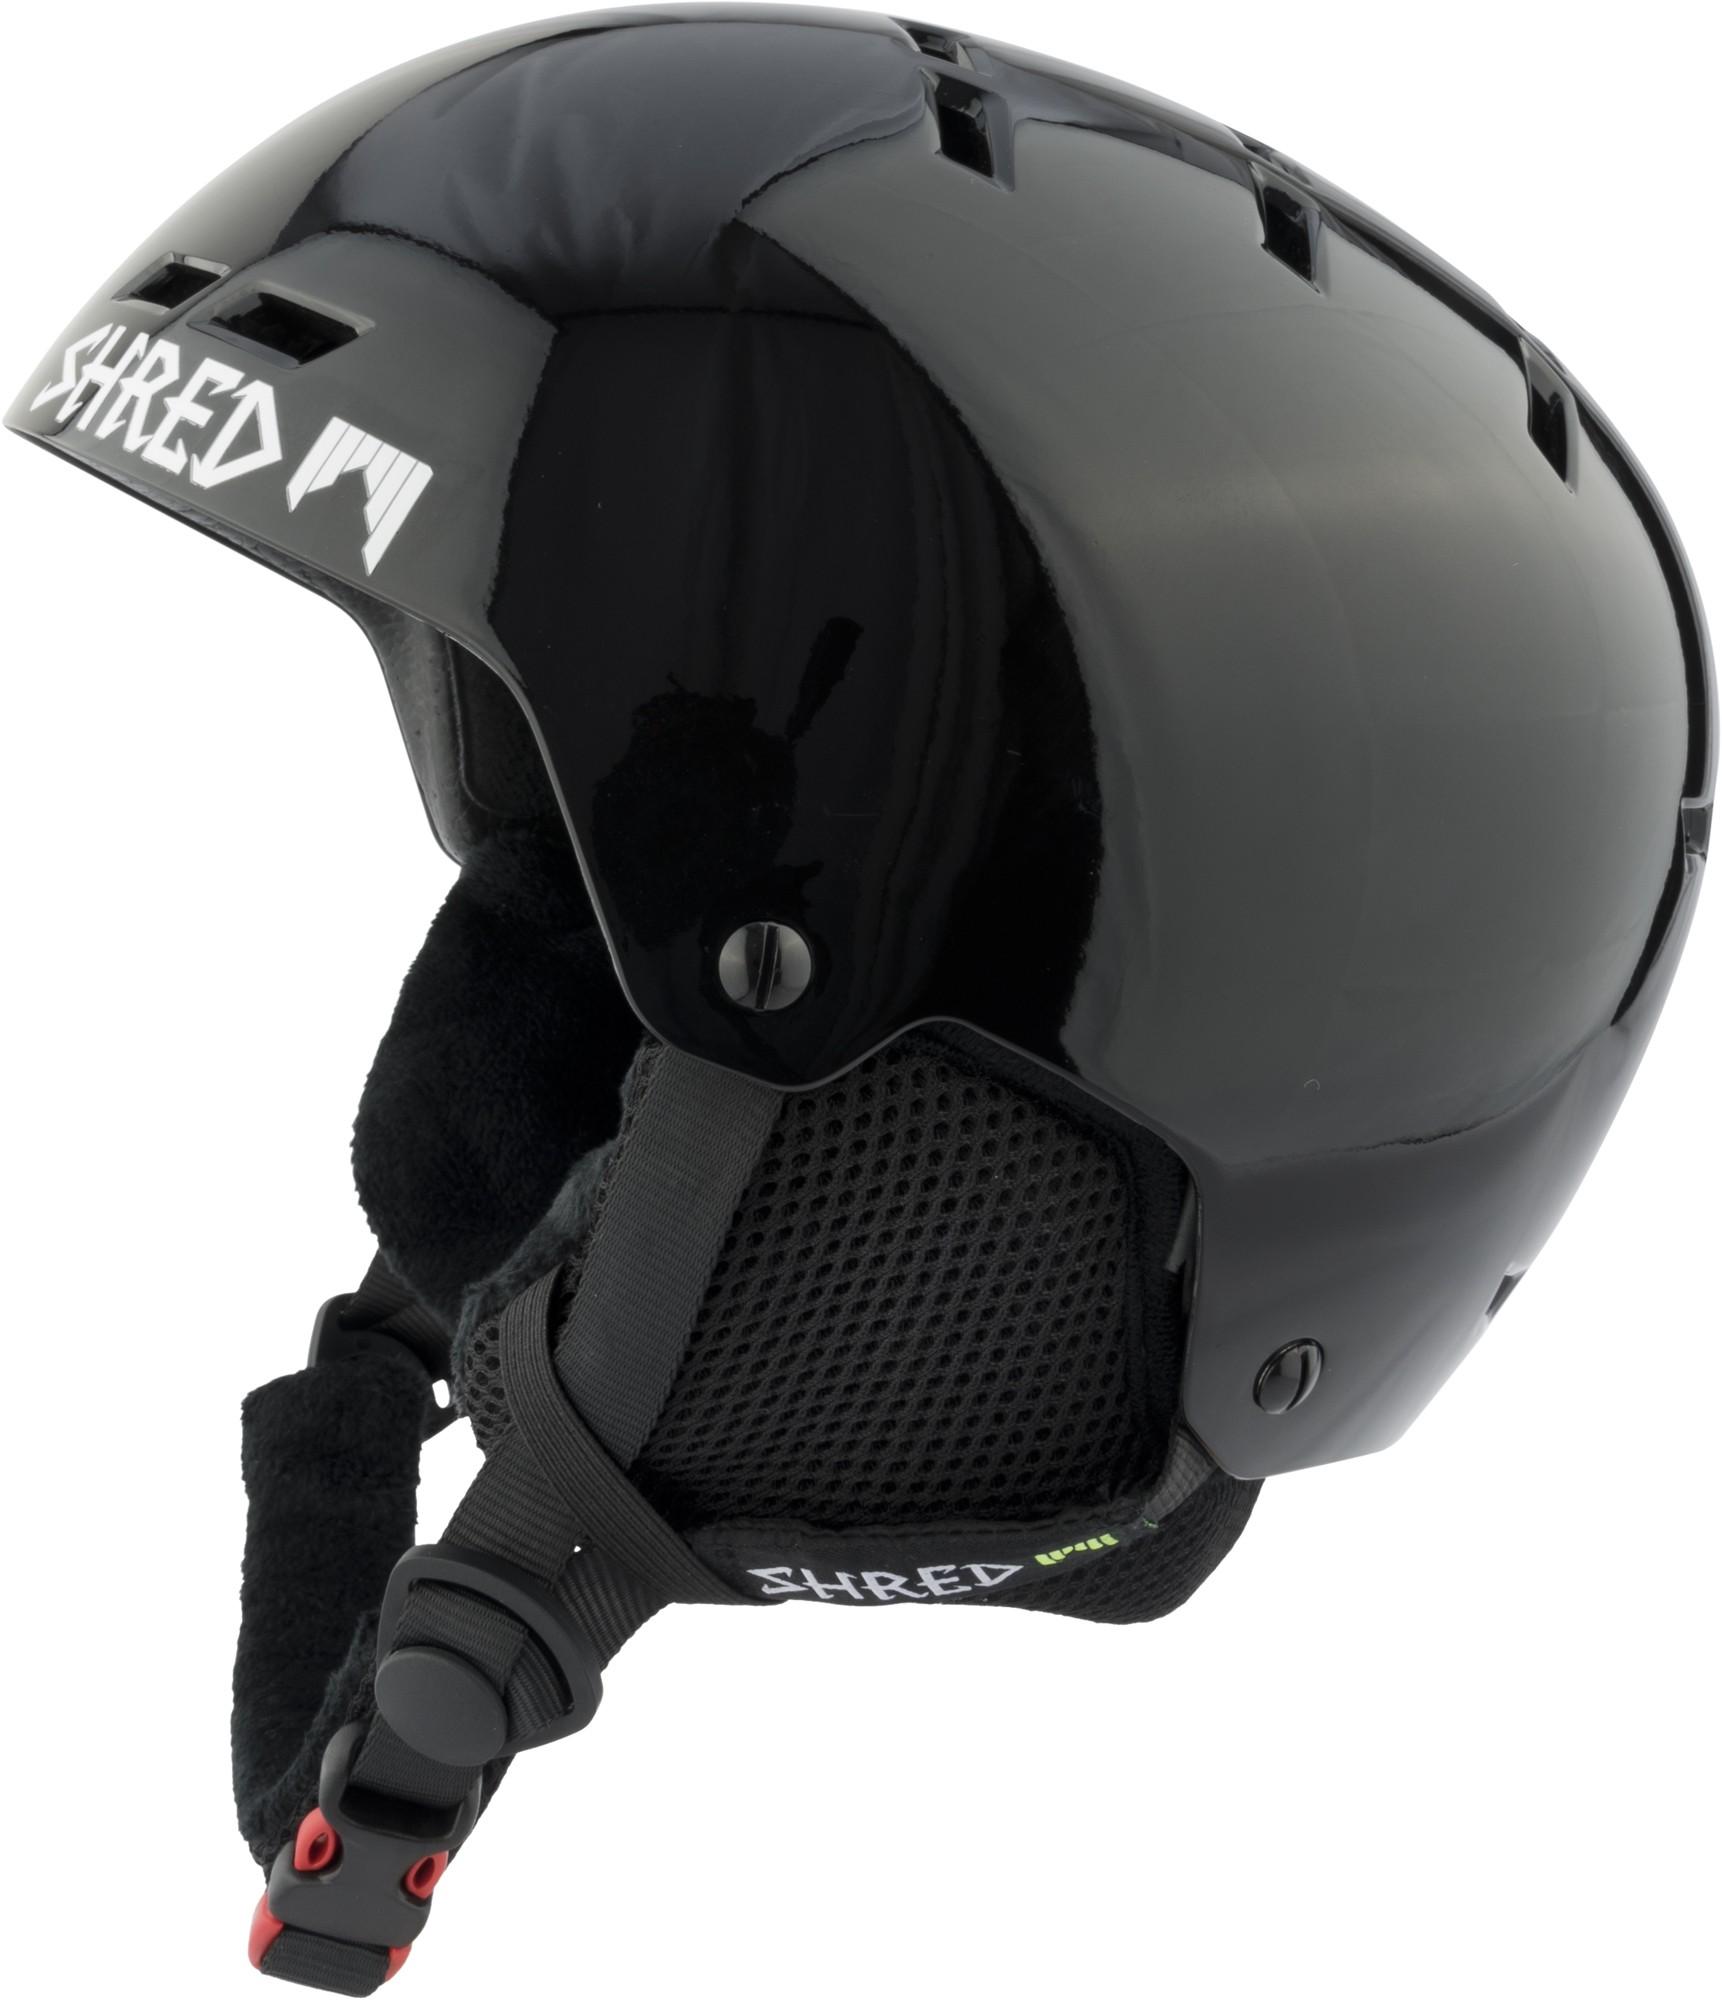 Shred BUMPER warm ECLIPSE ski helmet, 2018